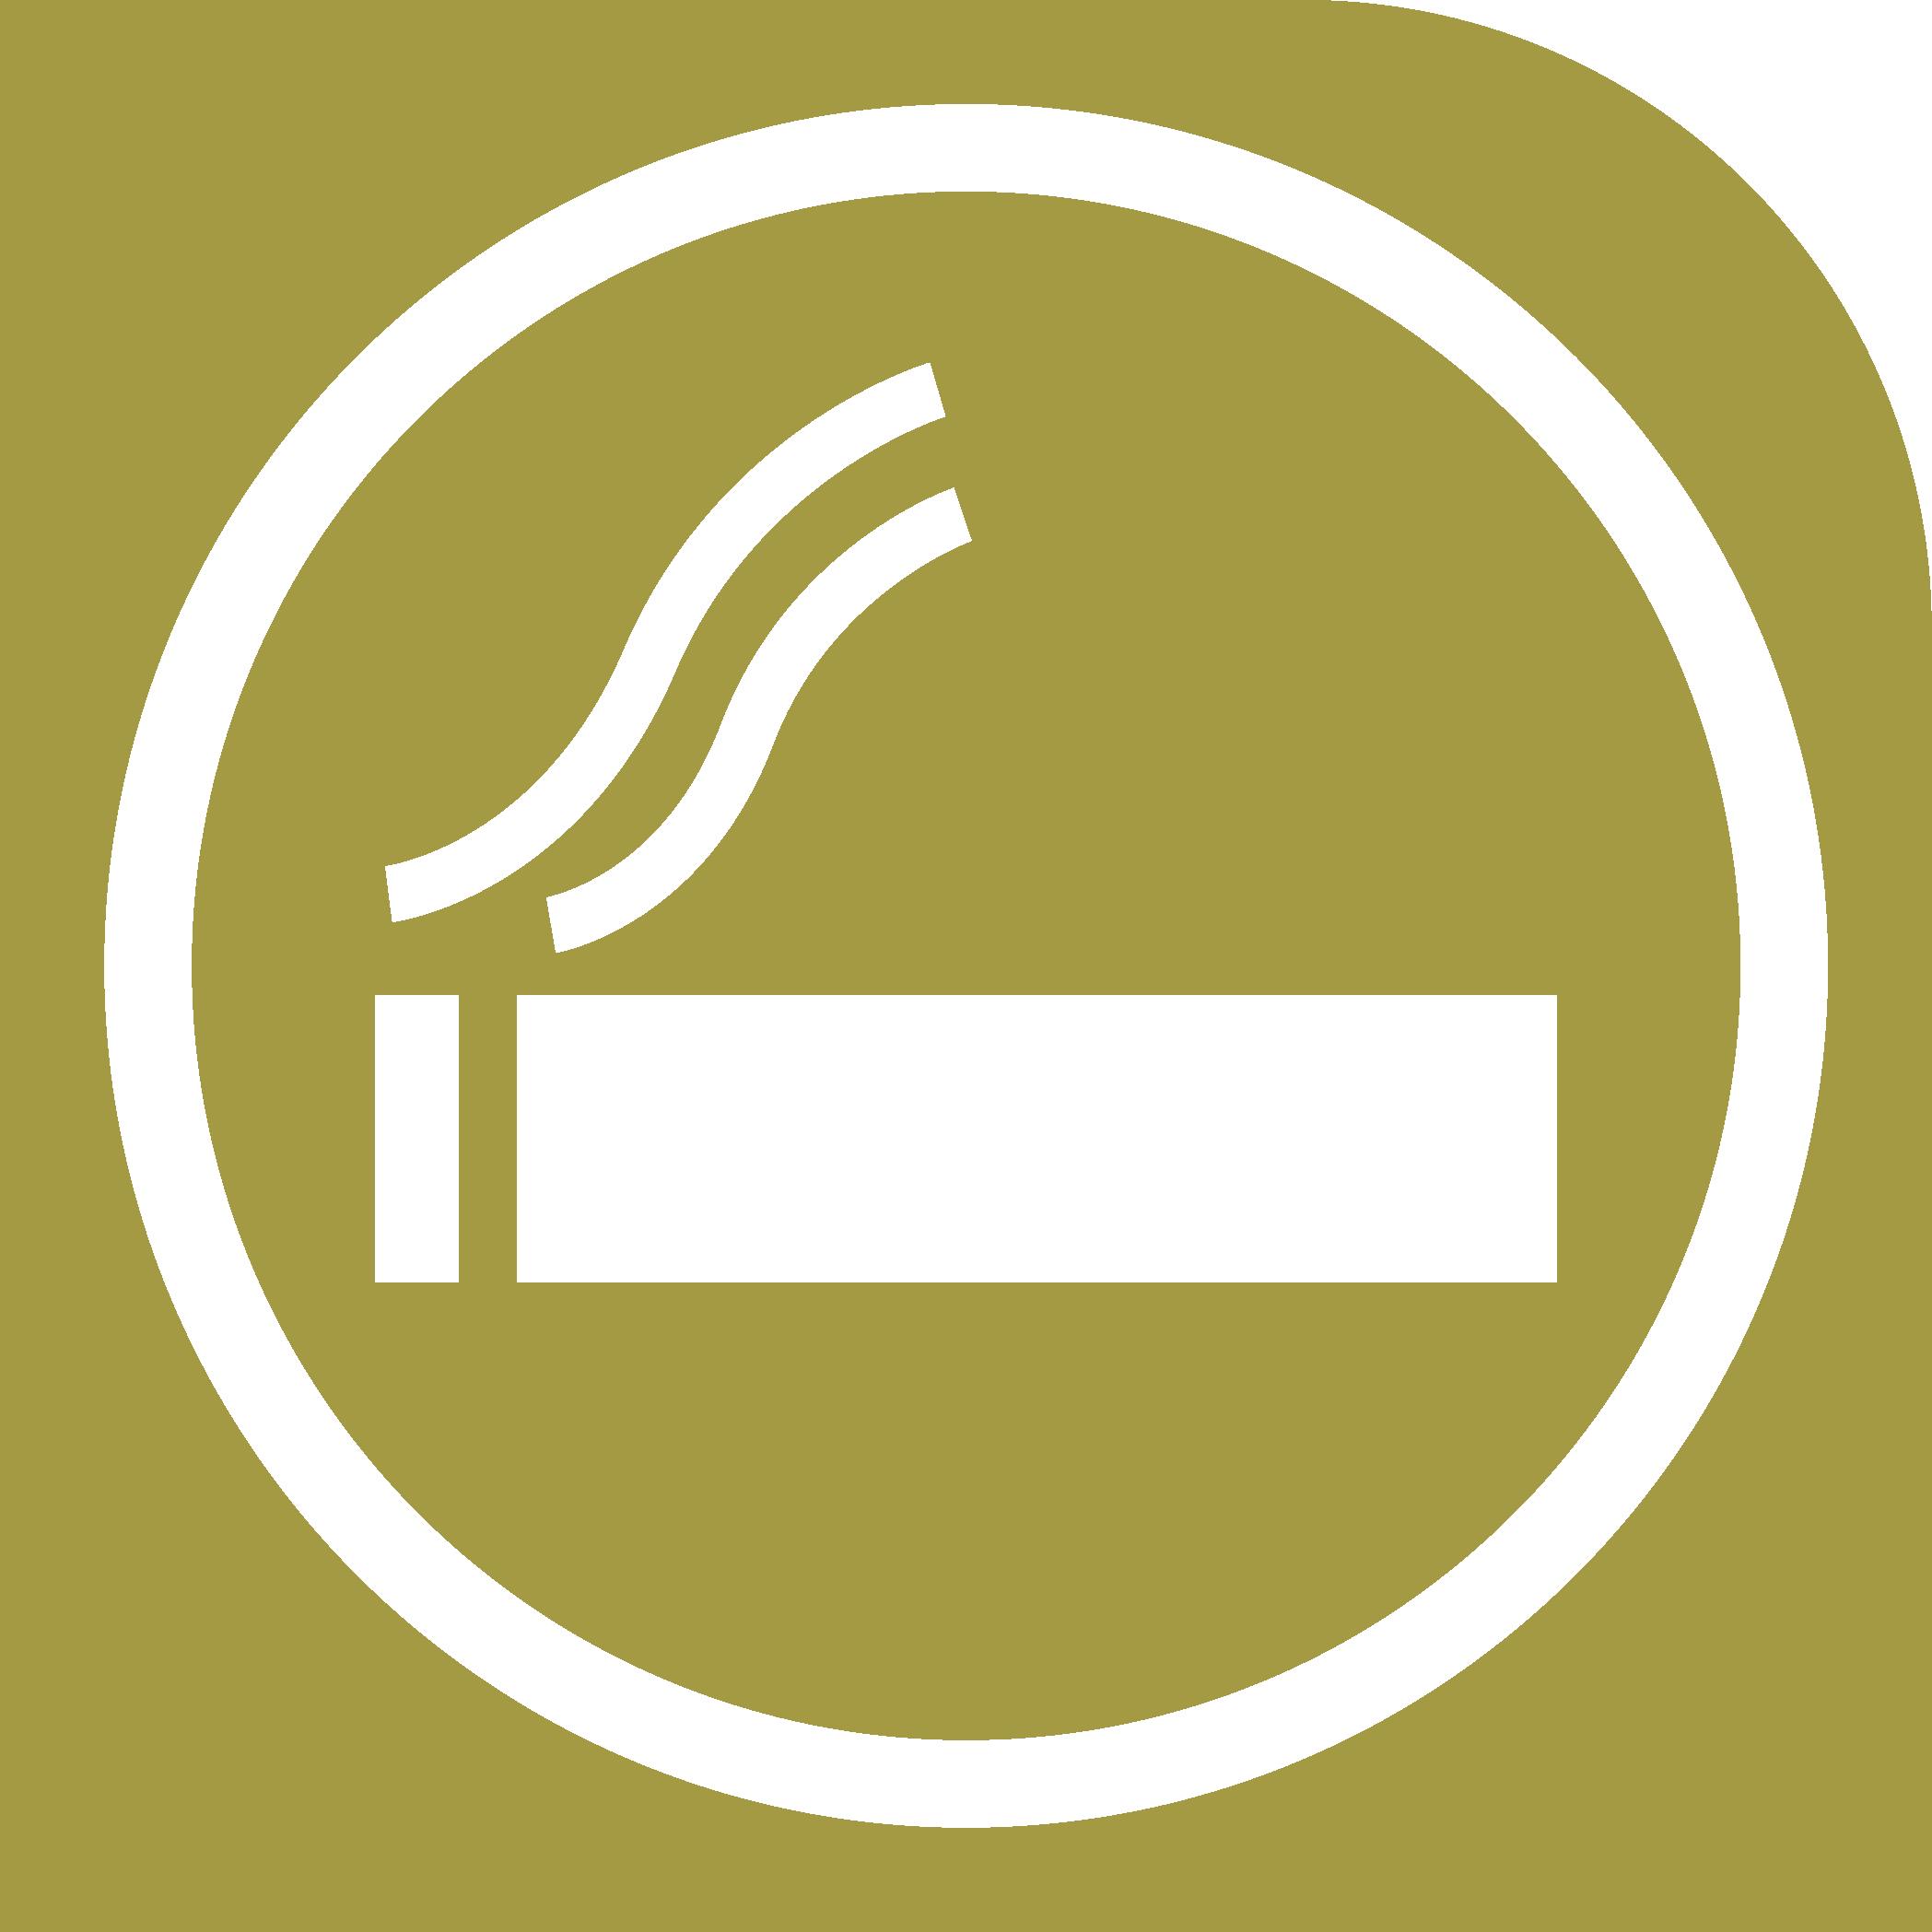 Spazi per Fumatori